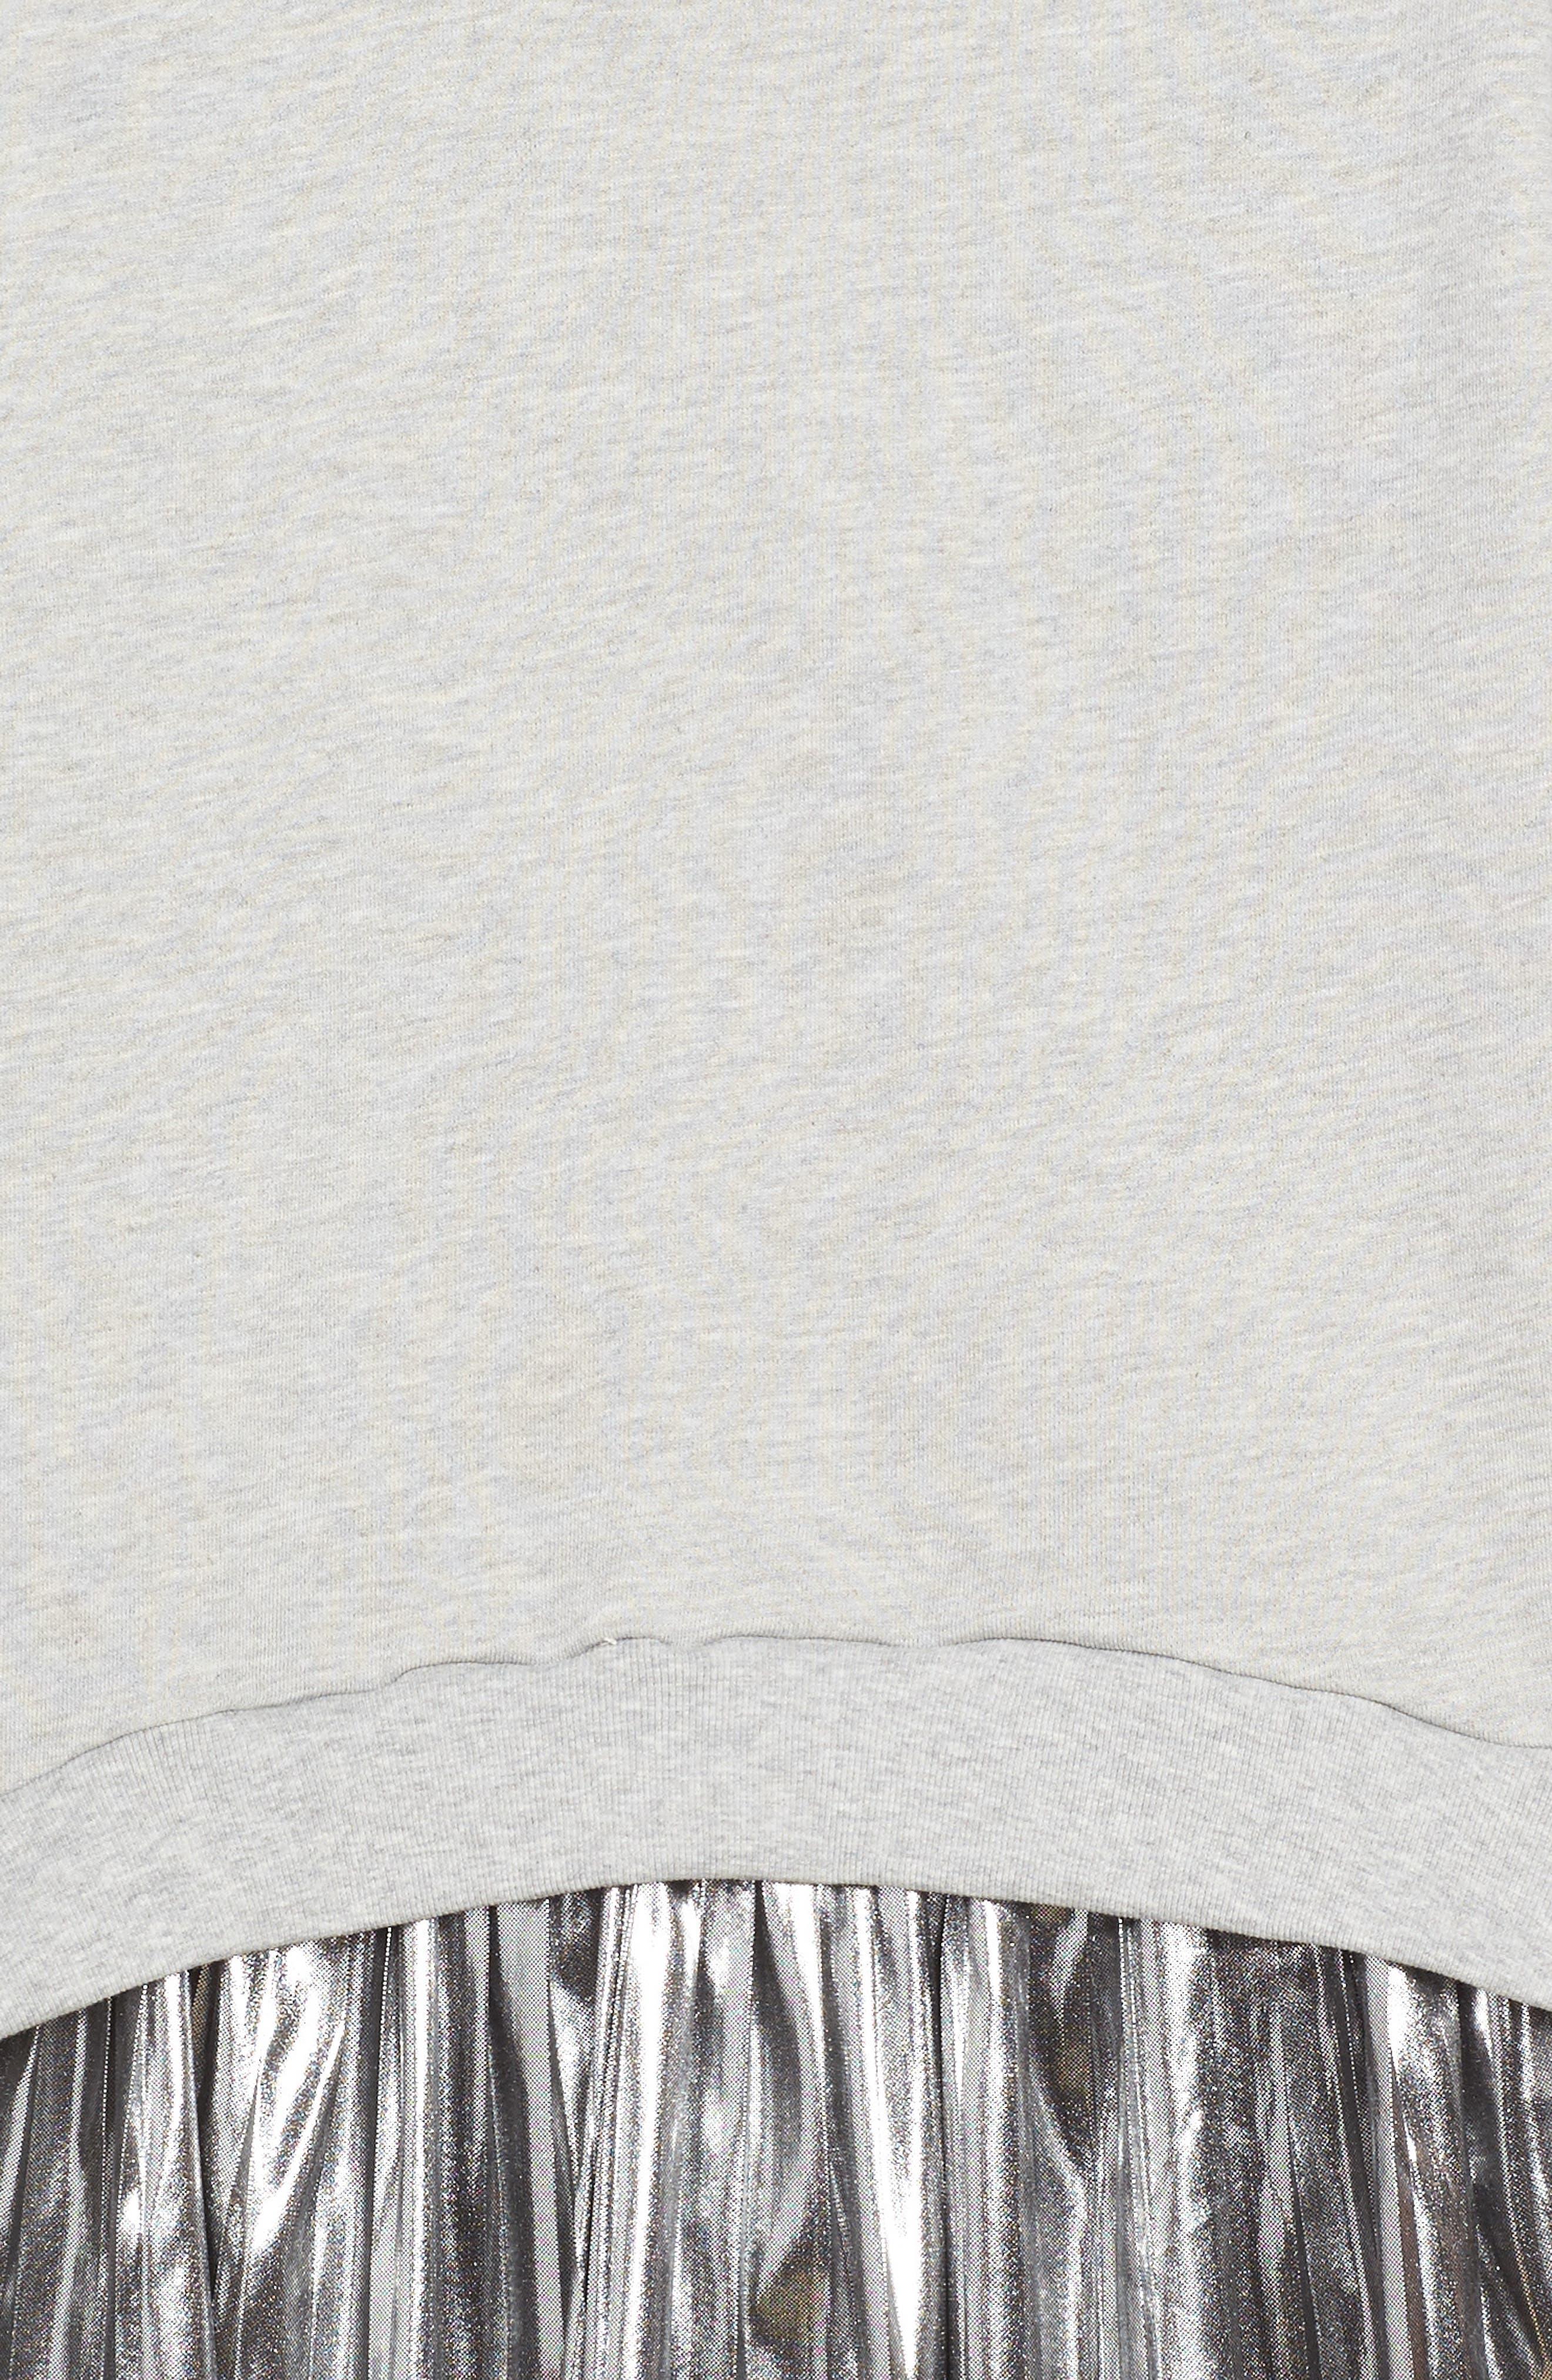 Metallic Sweatshirt Dress,                             Alternate thumbnail 3, color,                             020